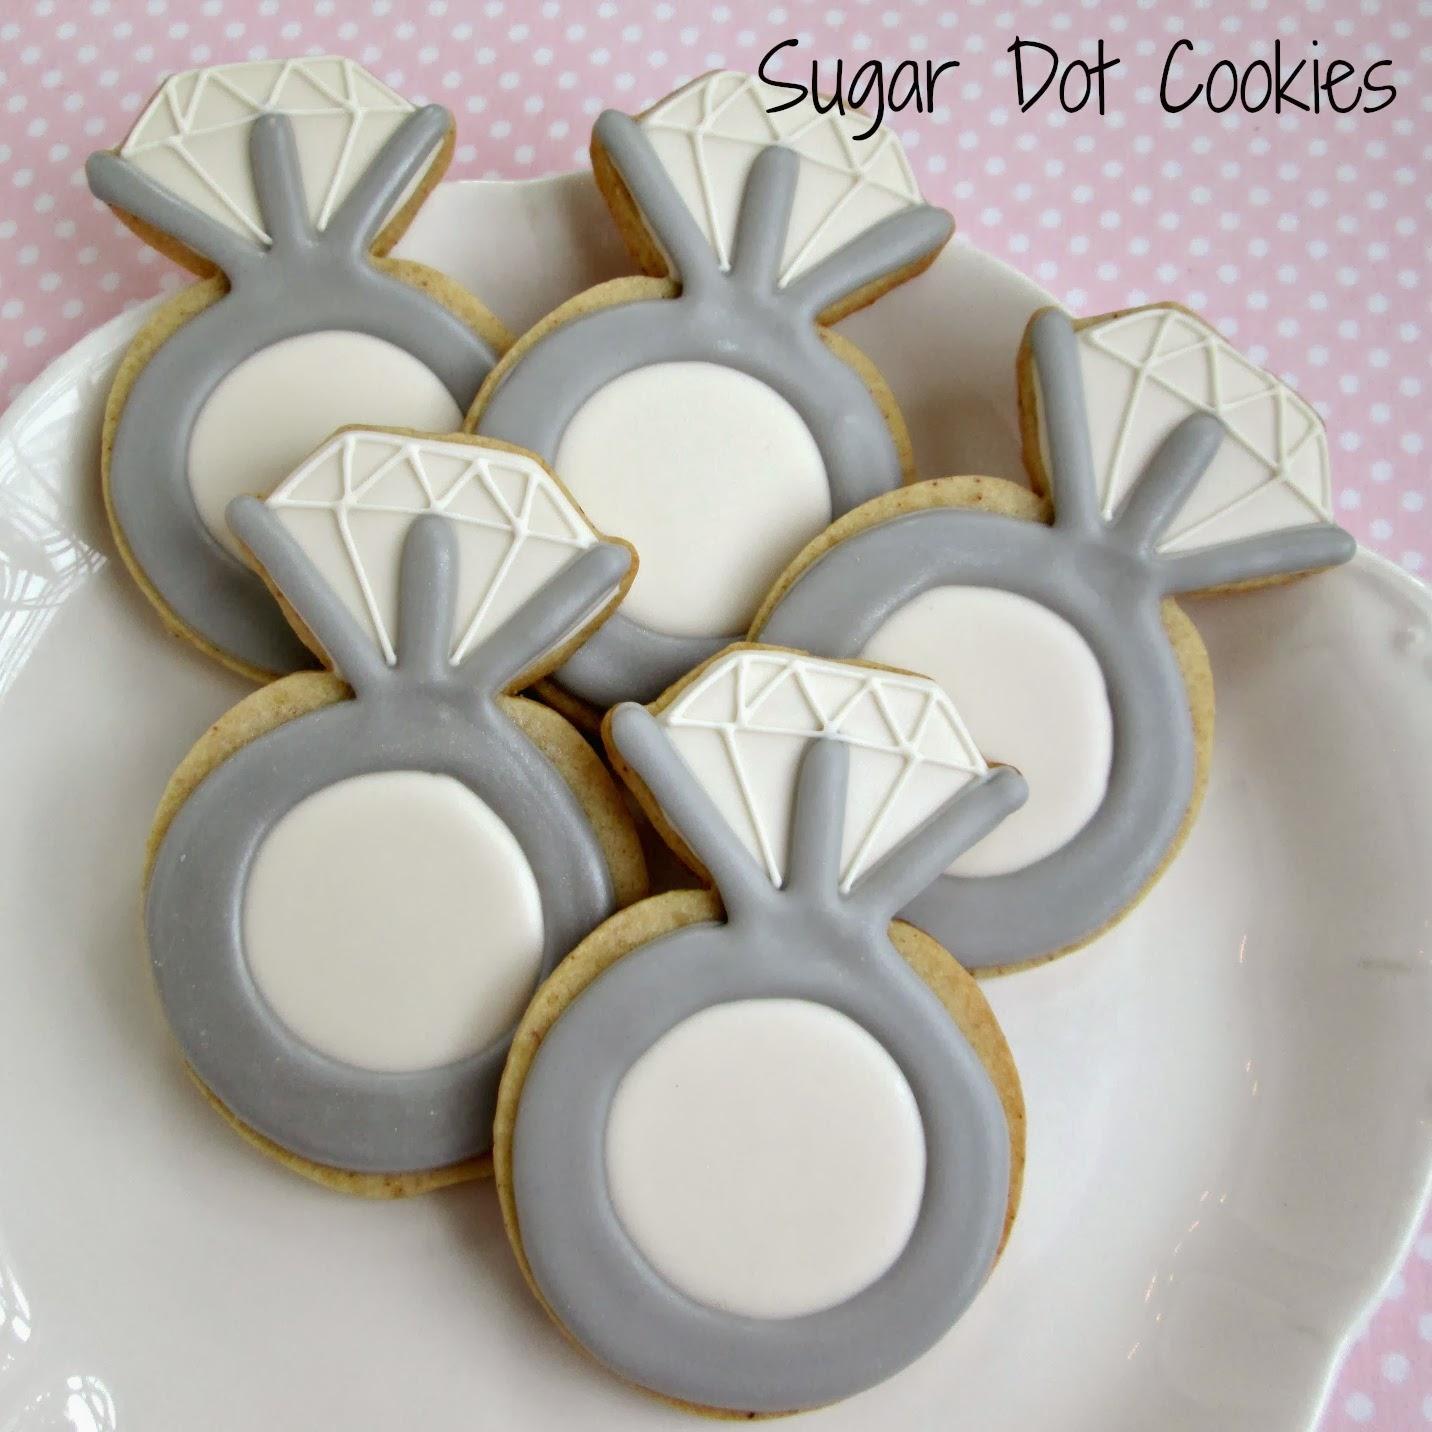 Sugar Dot Cookies: Engagement Ring Cookies